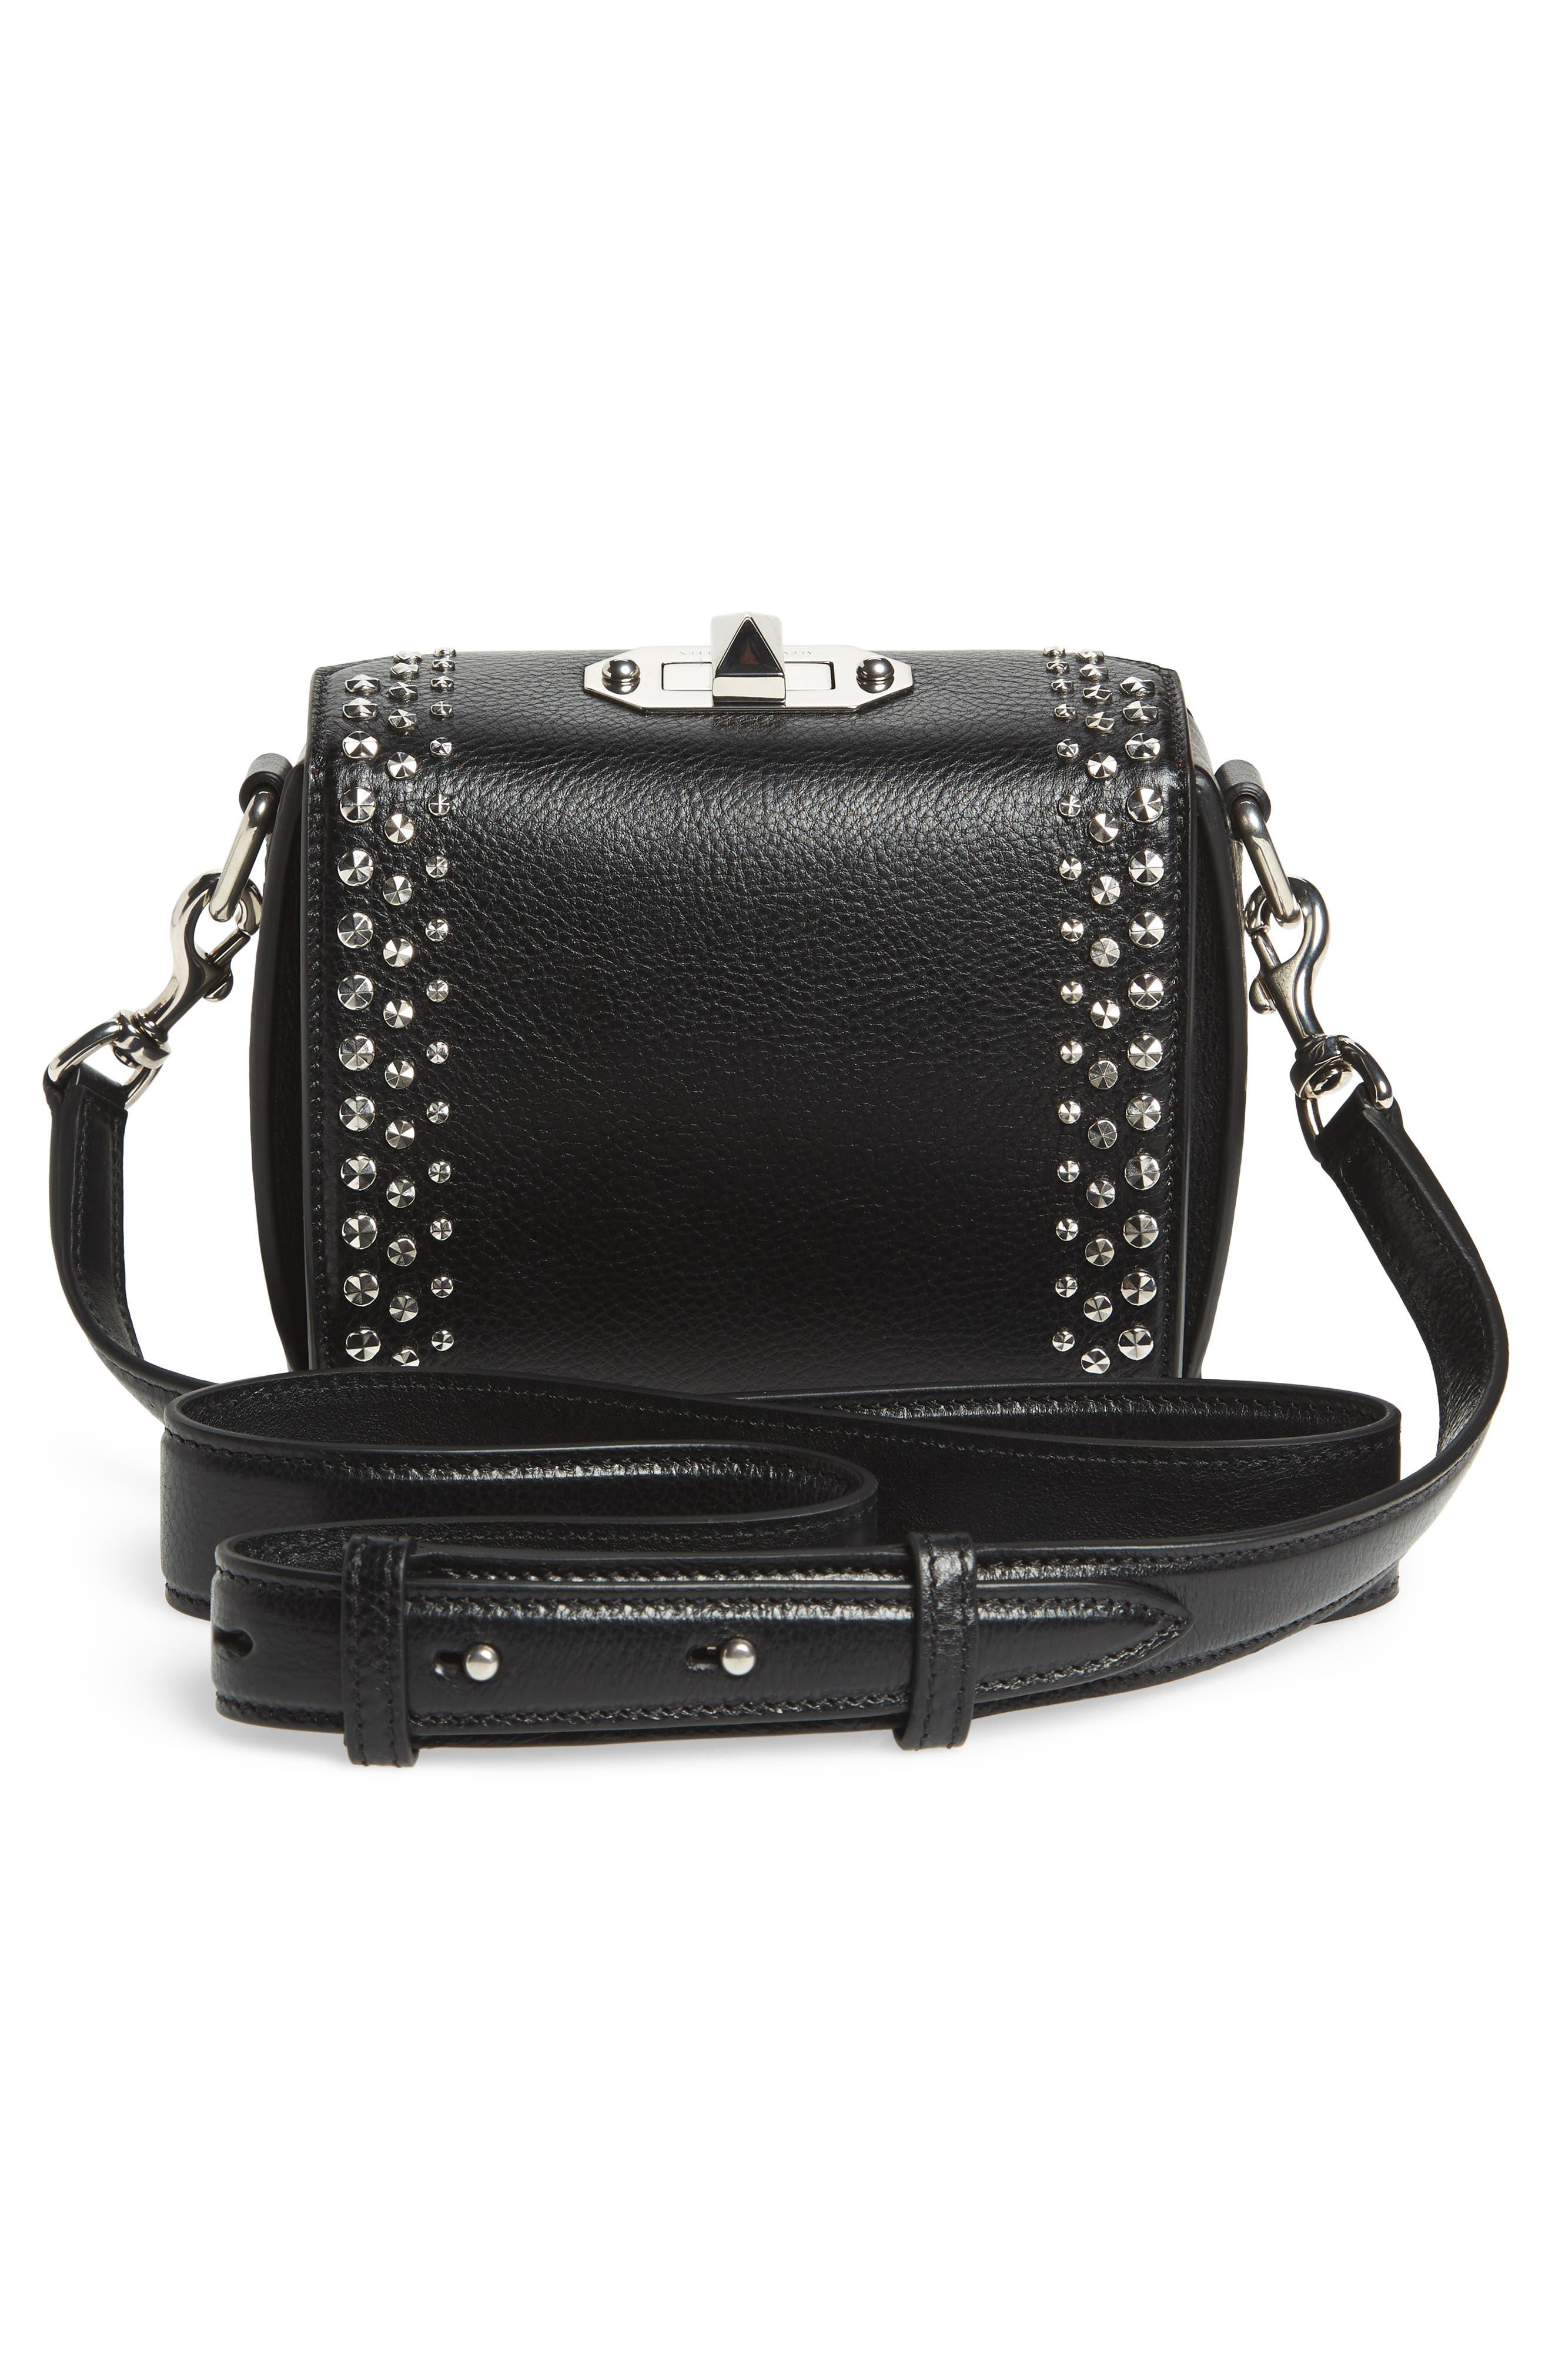 Alternate Image 3  - Alexander McQueen Box Bag 16 Studded Leather Bag